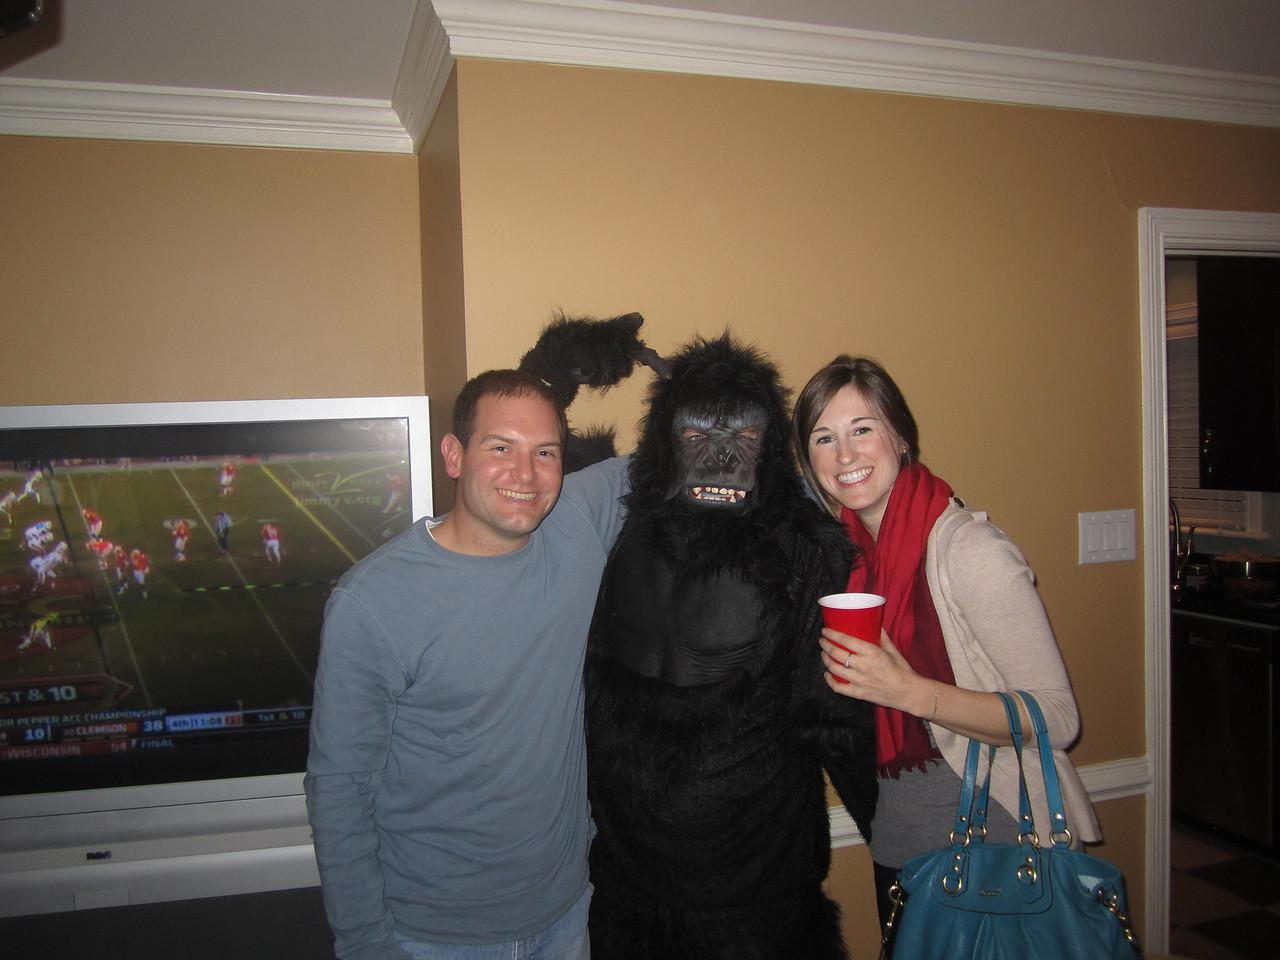 Jon, Preston the Gorilla and Susan